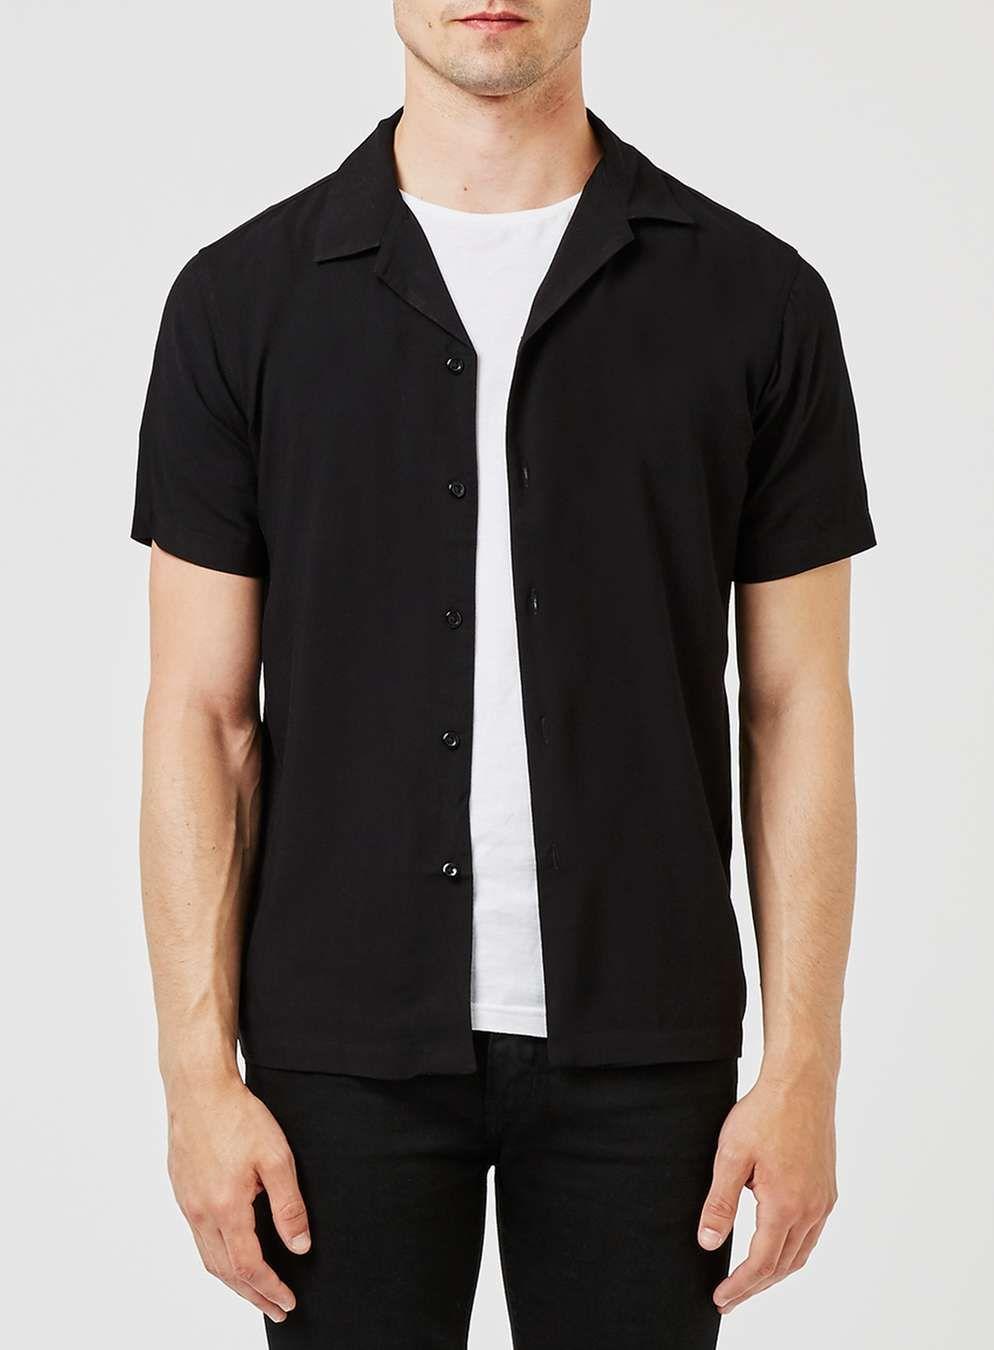 Black Revere Collar Short Sleeve Dress Shirt - Collared Shirts ...